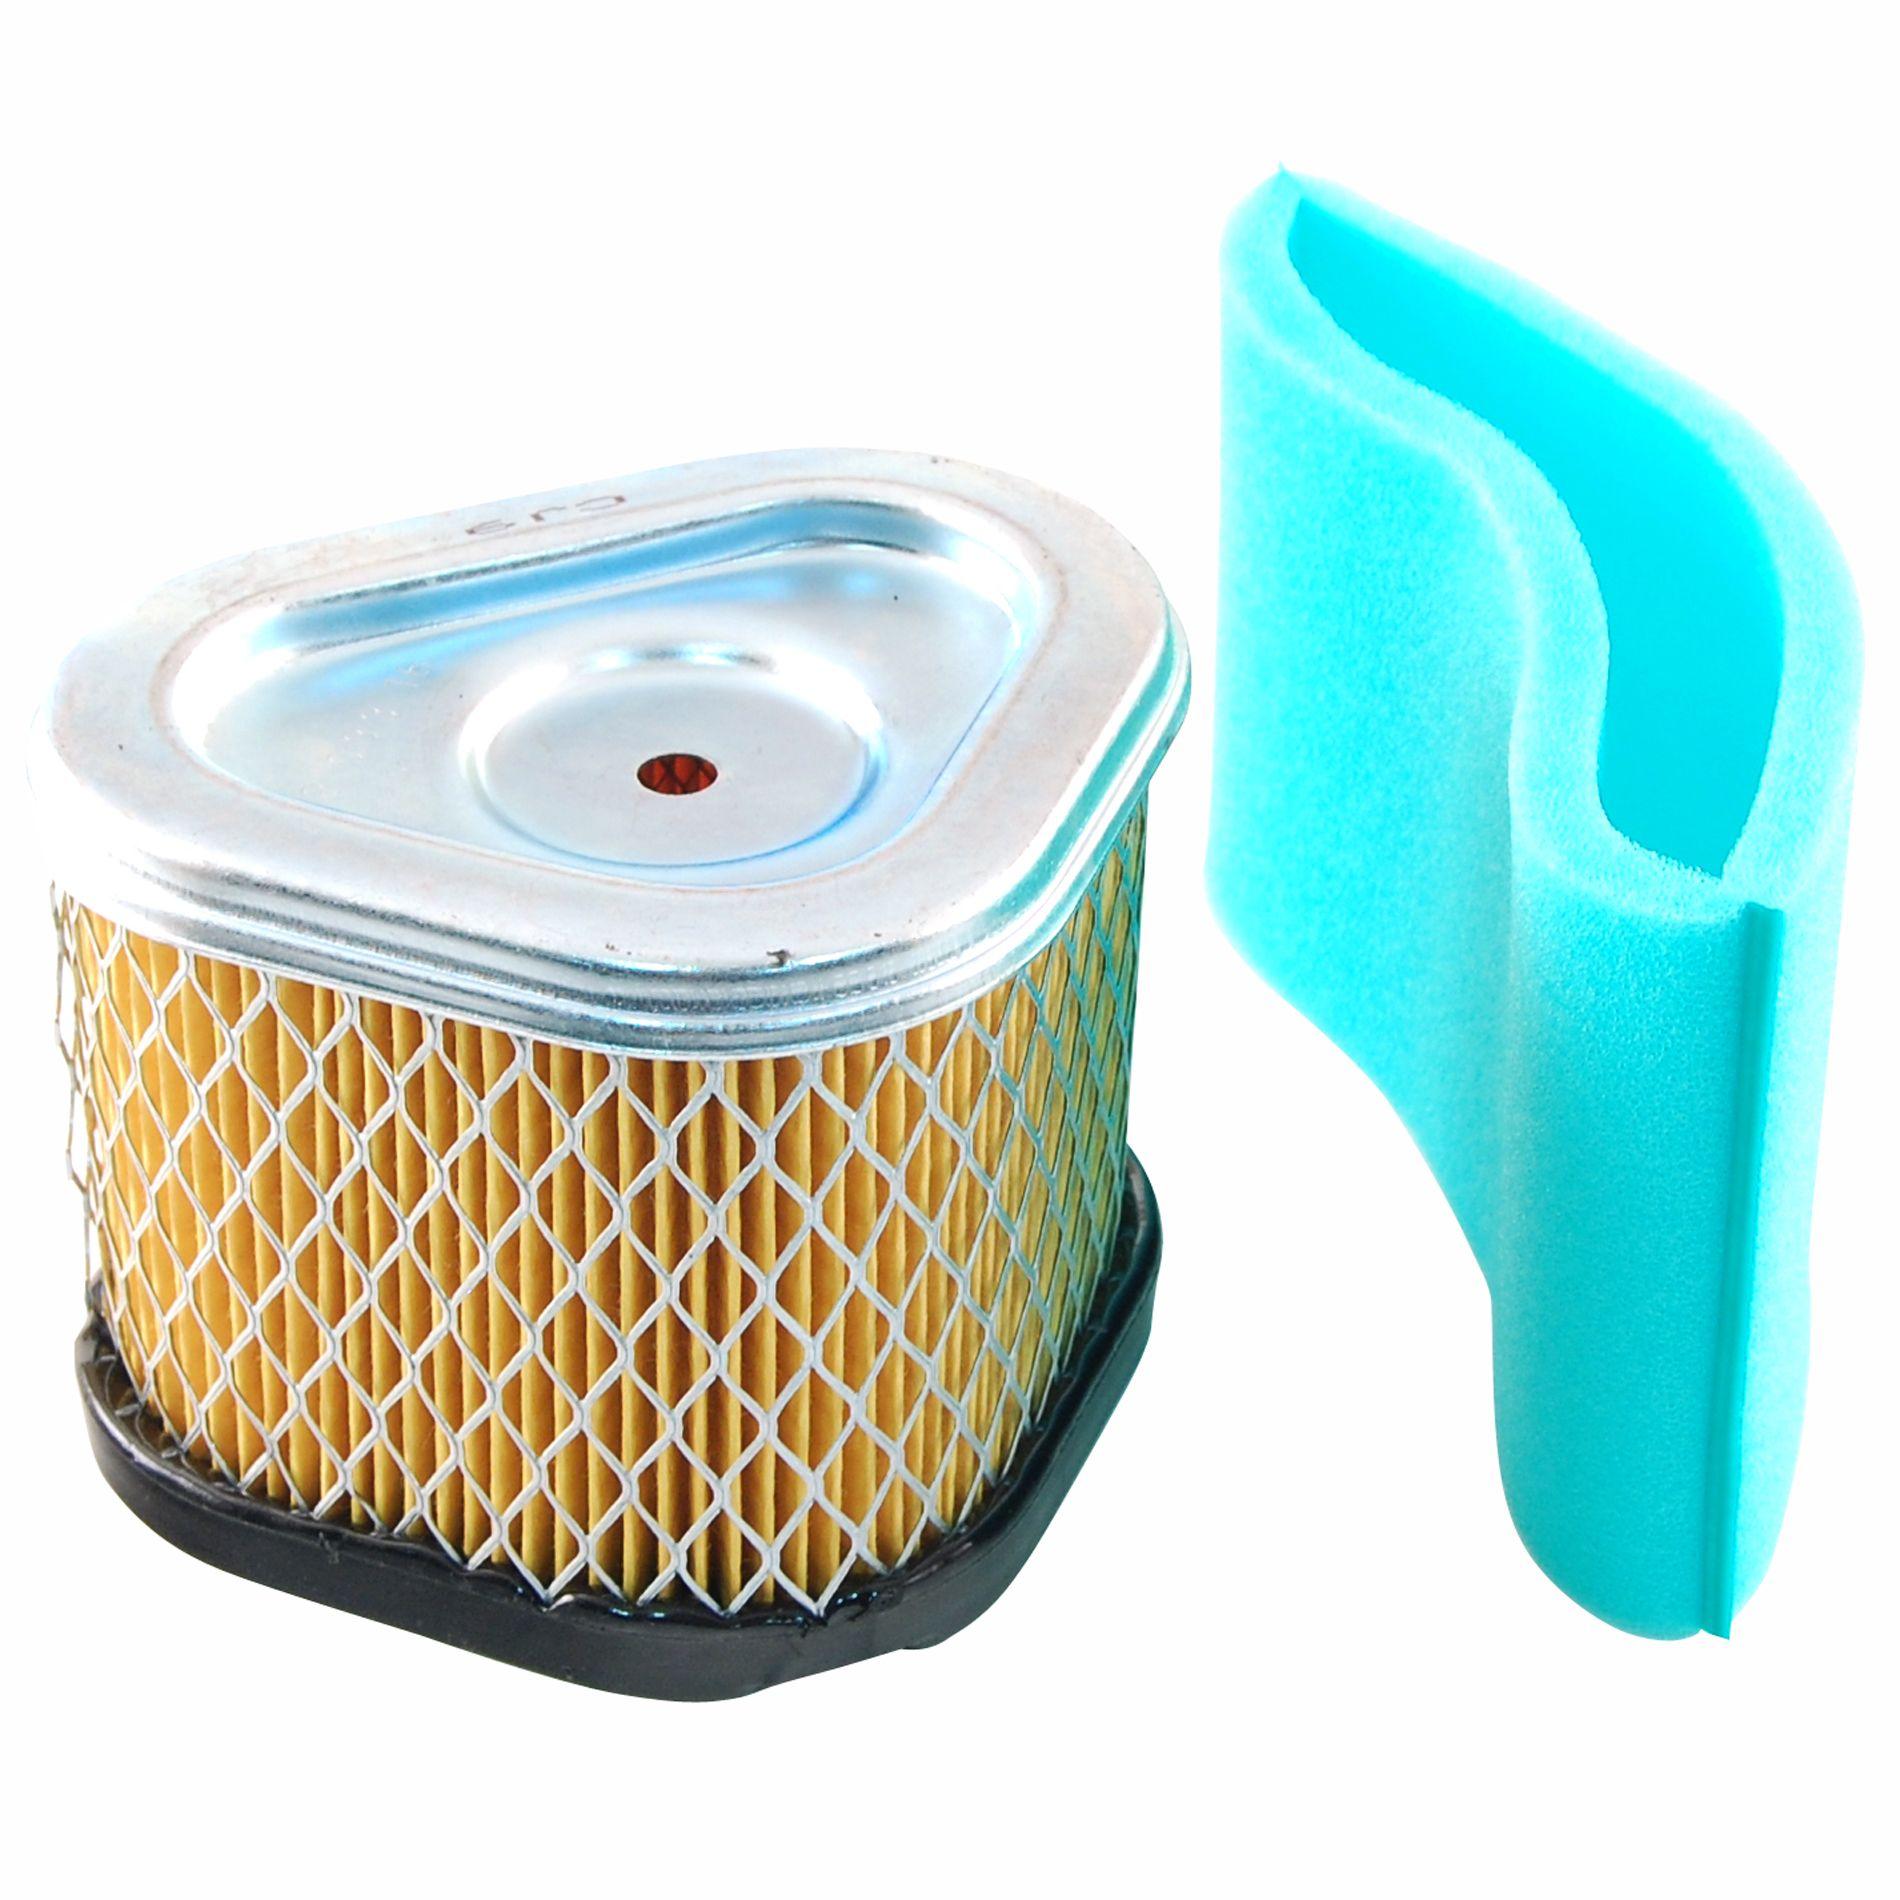 Craftsman 490 200 S031 Kohler Air Filter